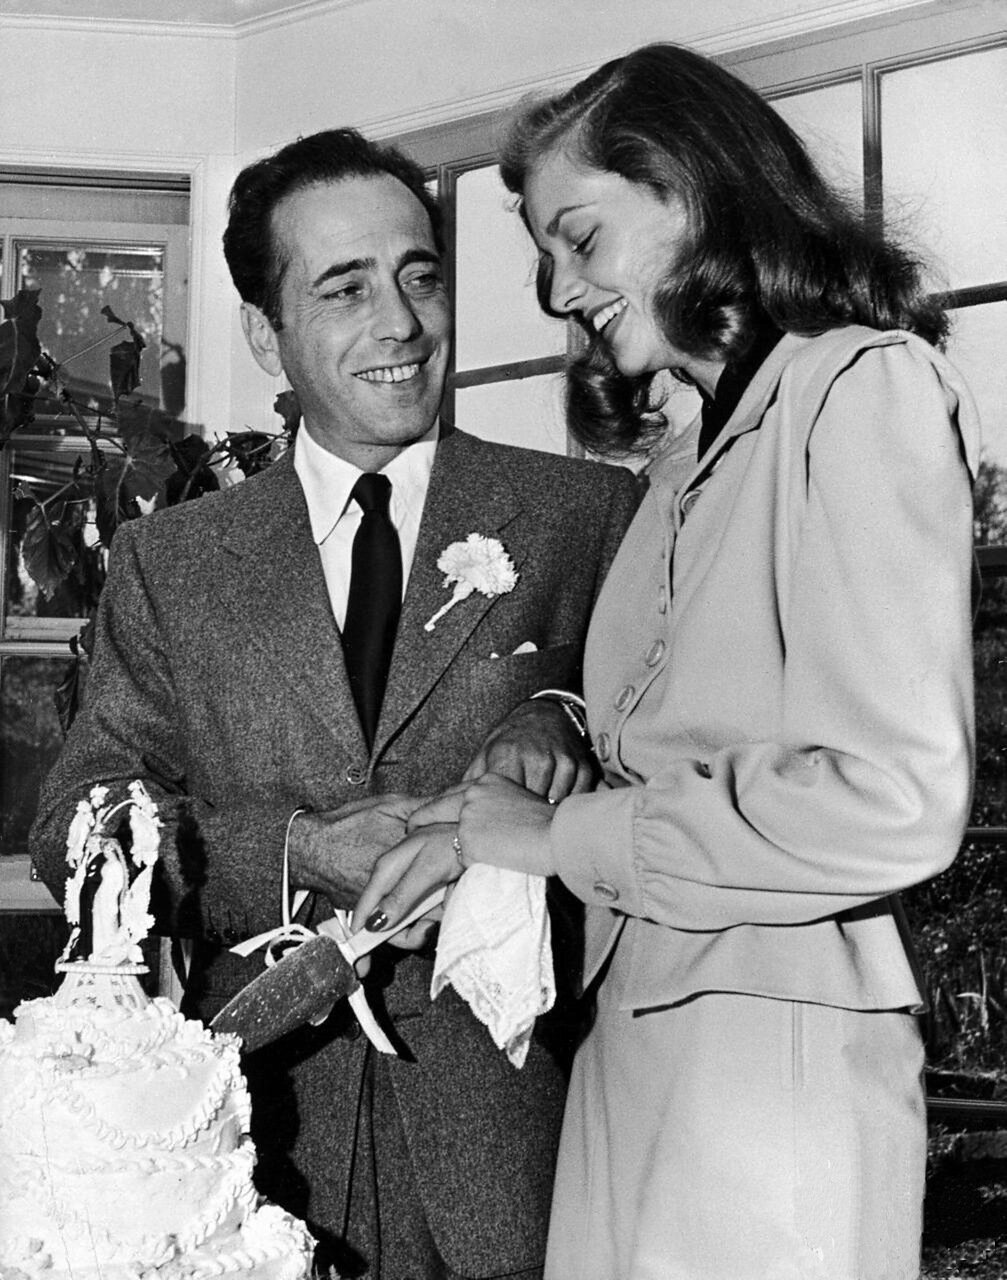 Свадьба Лорен Бэколл и Хамфри Богарта